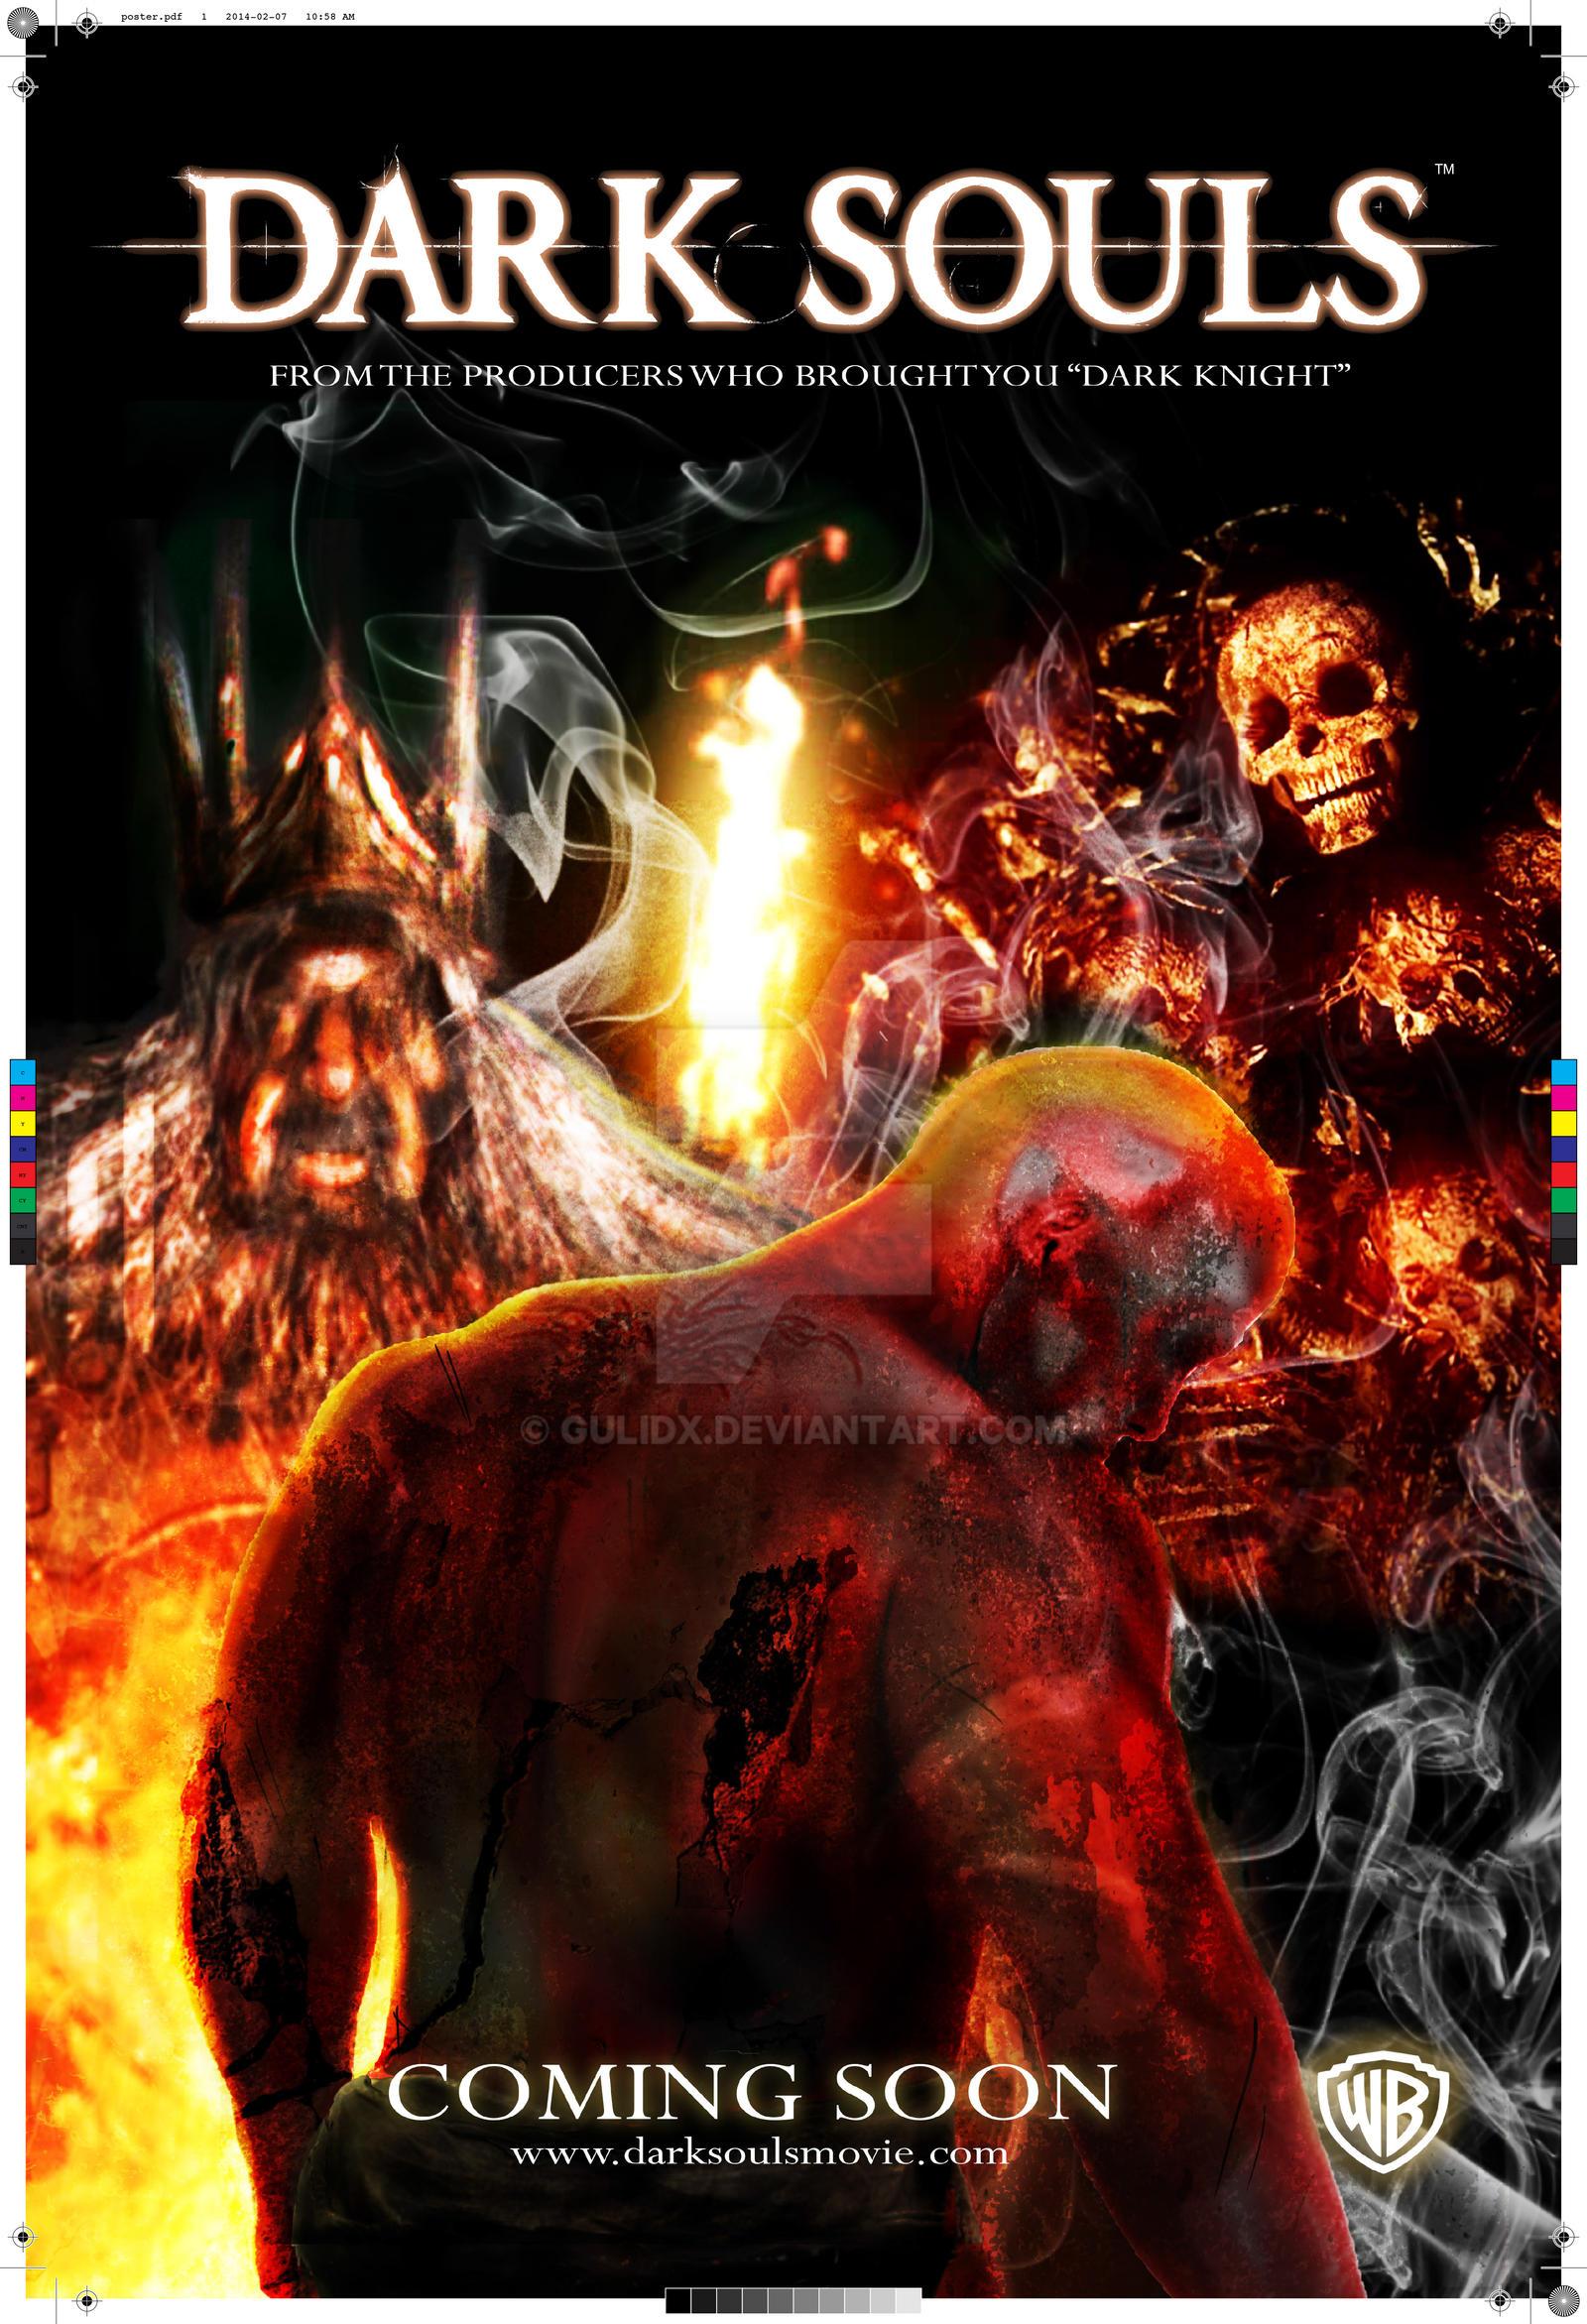 Dark Souls Film